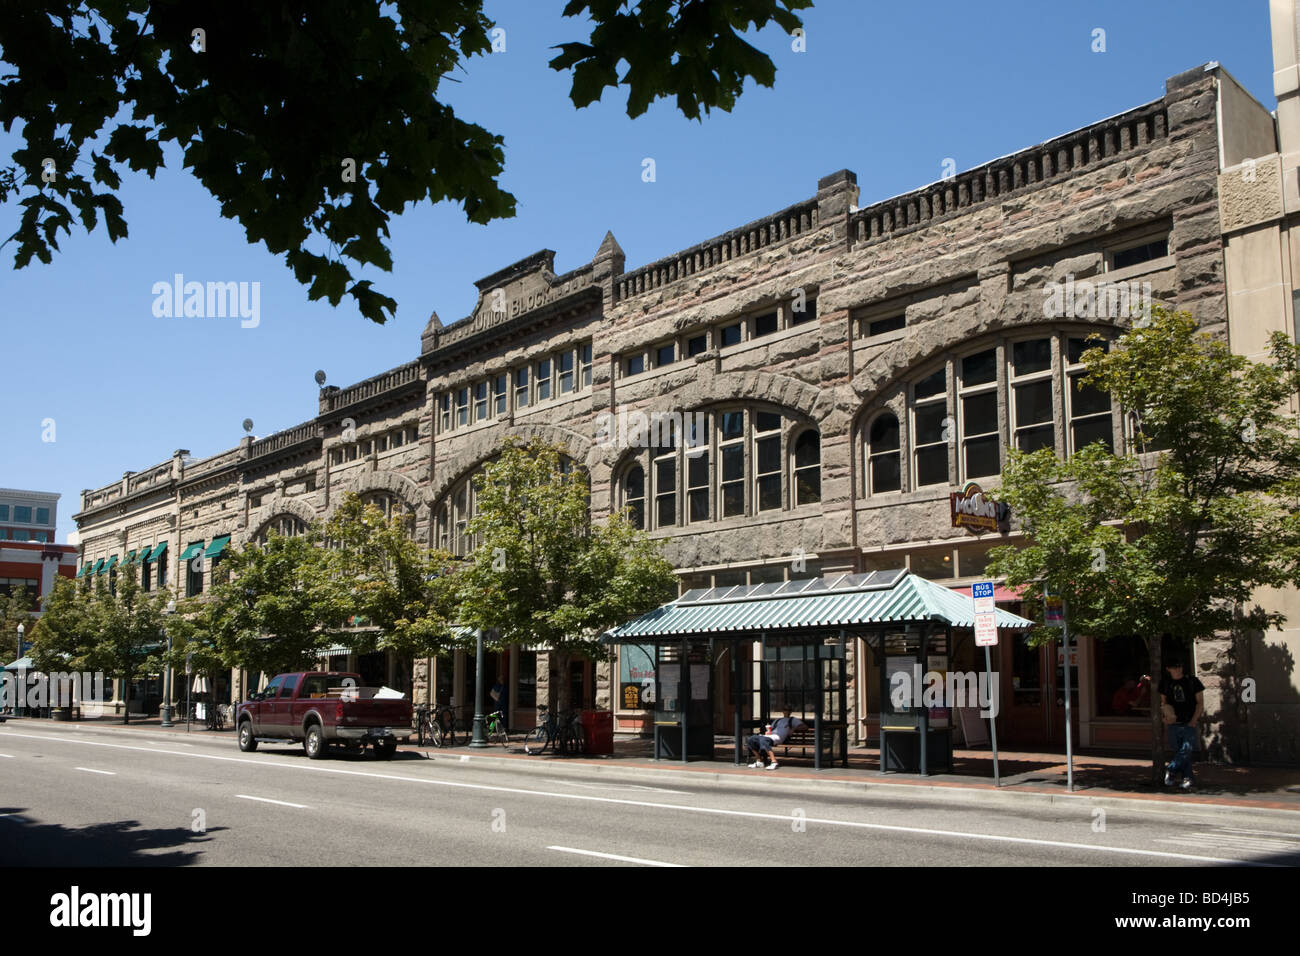 Historic Union Block in Boise Idaho - Stock Image